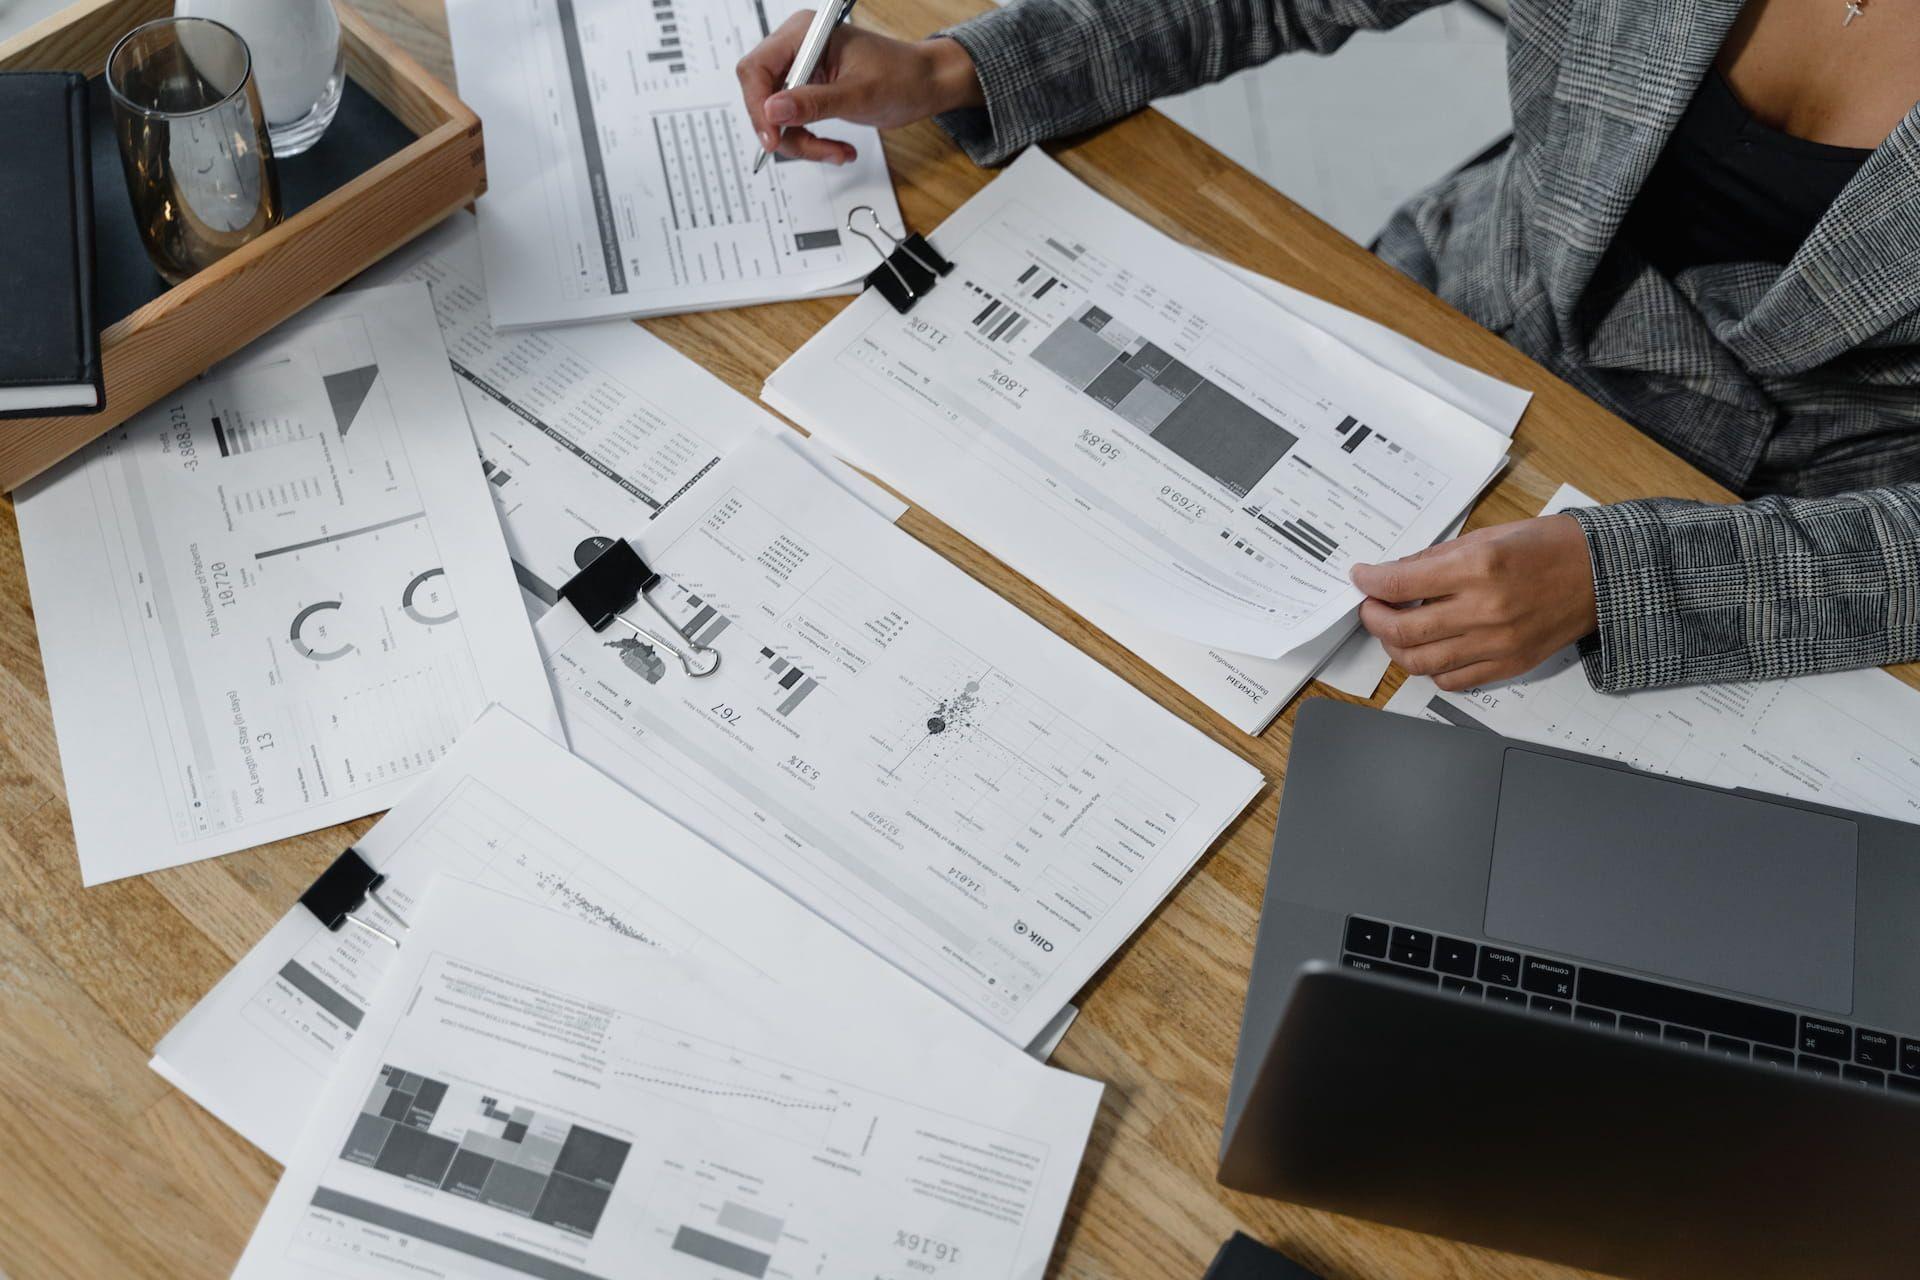 Measuring developer productivity